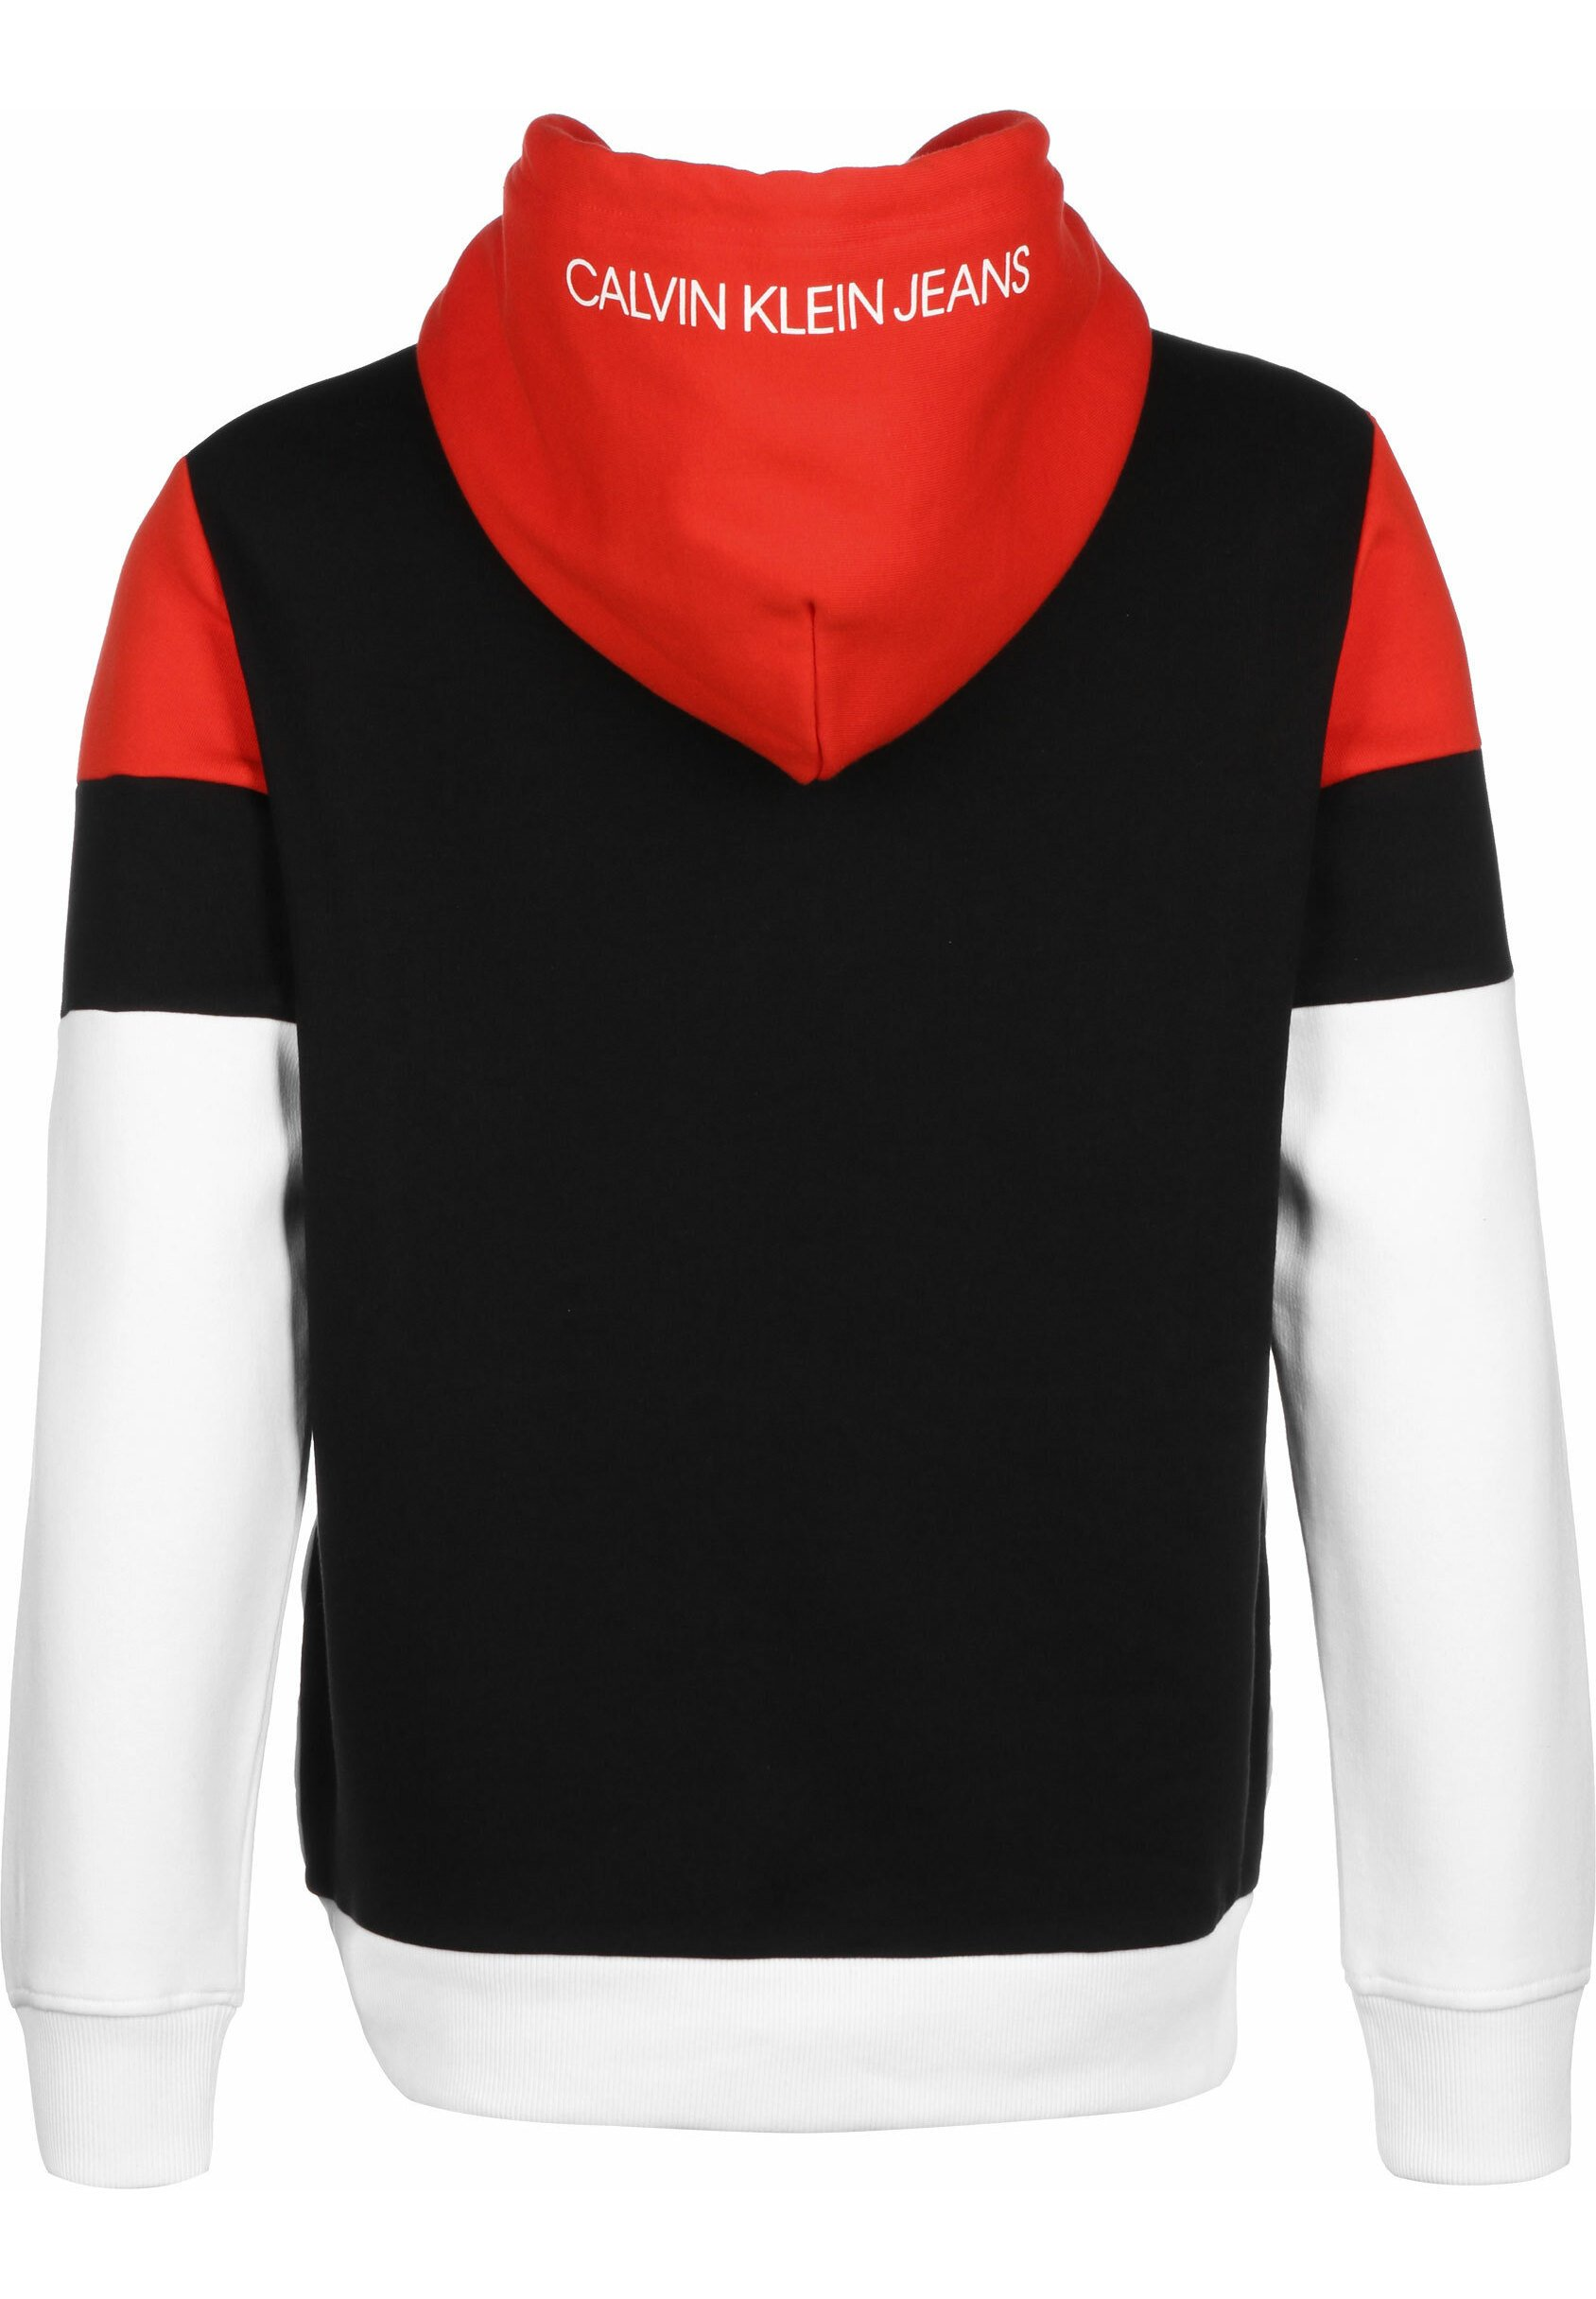 Calvin Klein Jeans Sweat à capuche - white/black/red